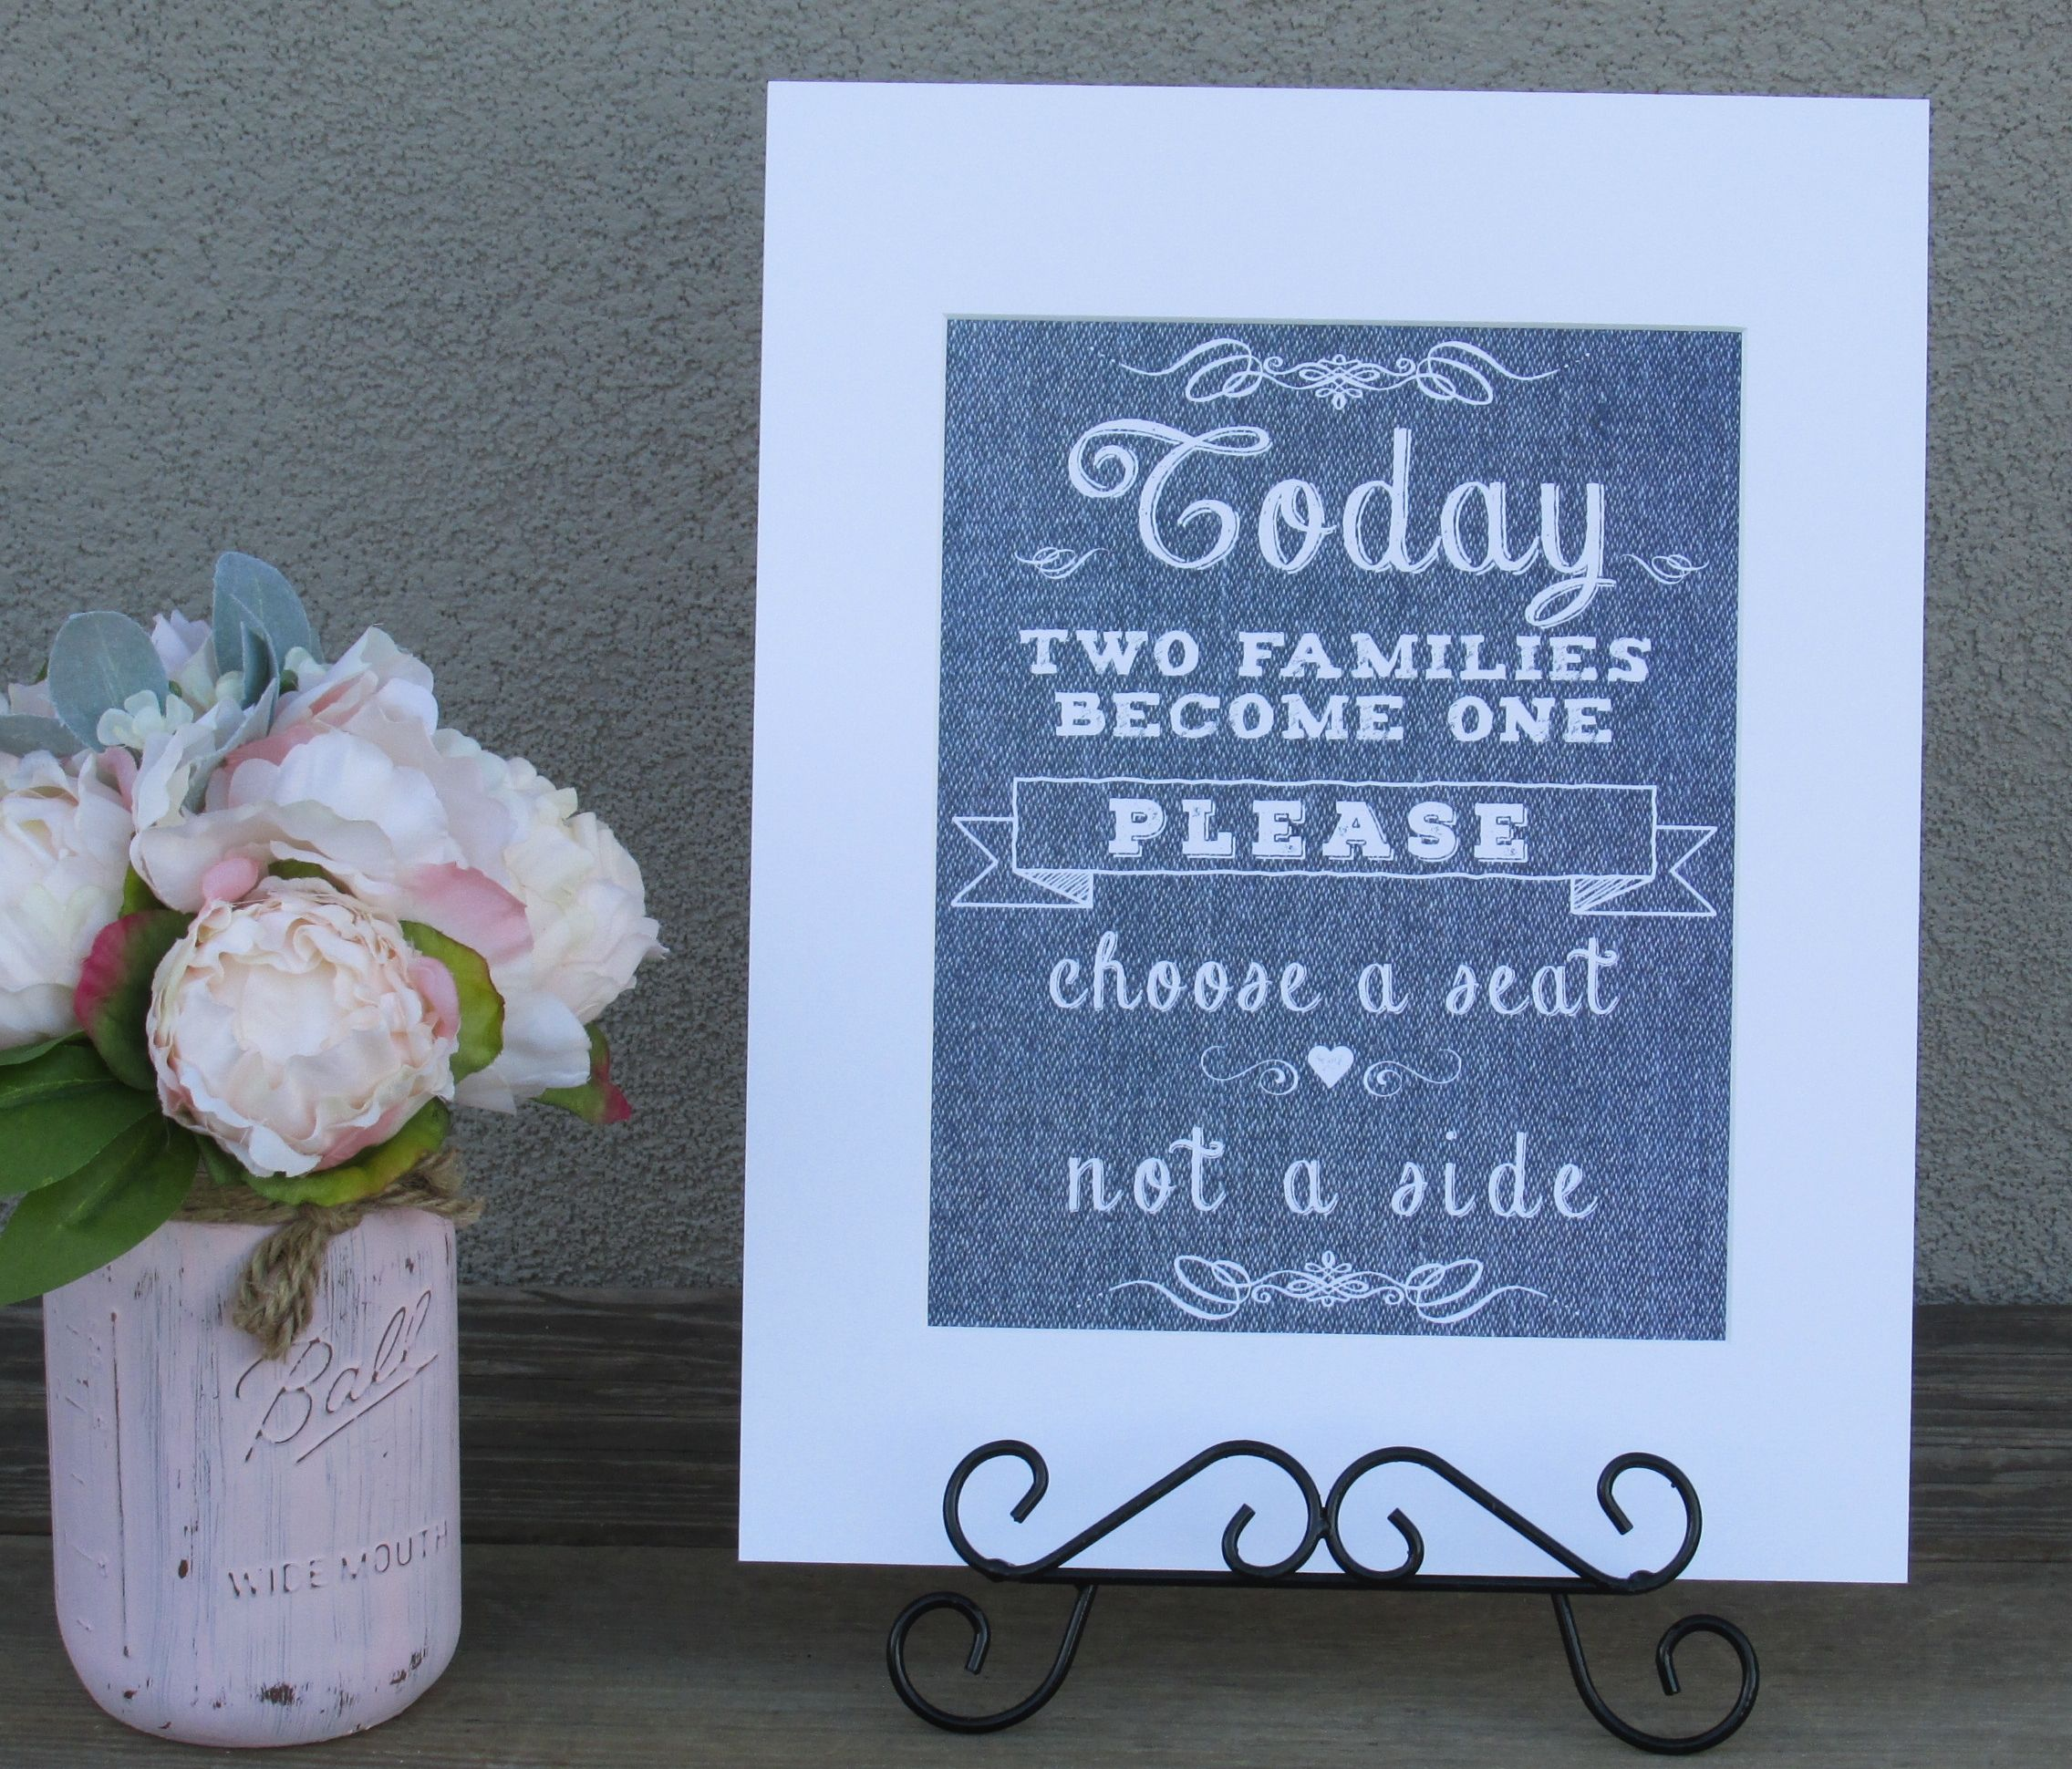 https://www.tradesy.com/weddings/wedding-decorations/light-blue-denim-look-wedding-signs-will-be-perfect-for-a-burlap-lace-and-denim-wedding-2032004/  #blue #bluewedding #bluethemedwedding #weddingdecor #denim #rustic #wedding #cute #classy  #seatingchart #todaytwofamiliesbecomeone